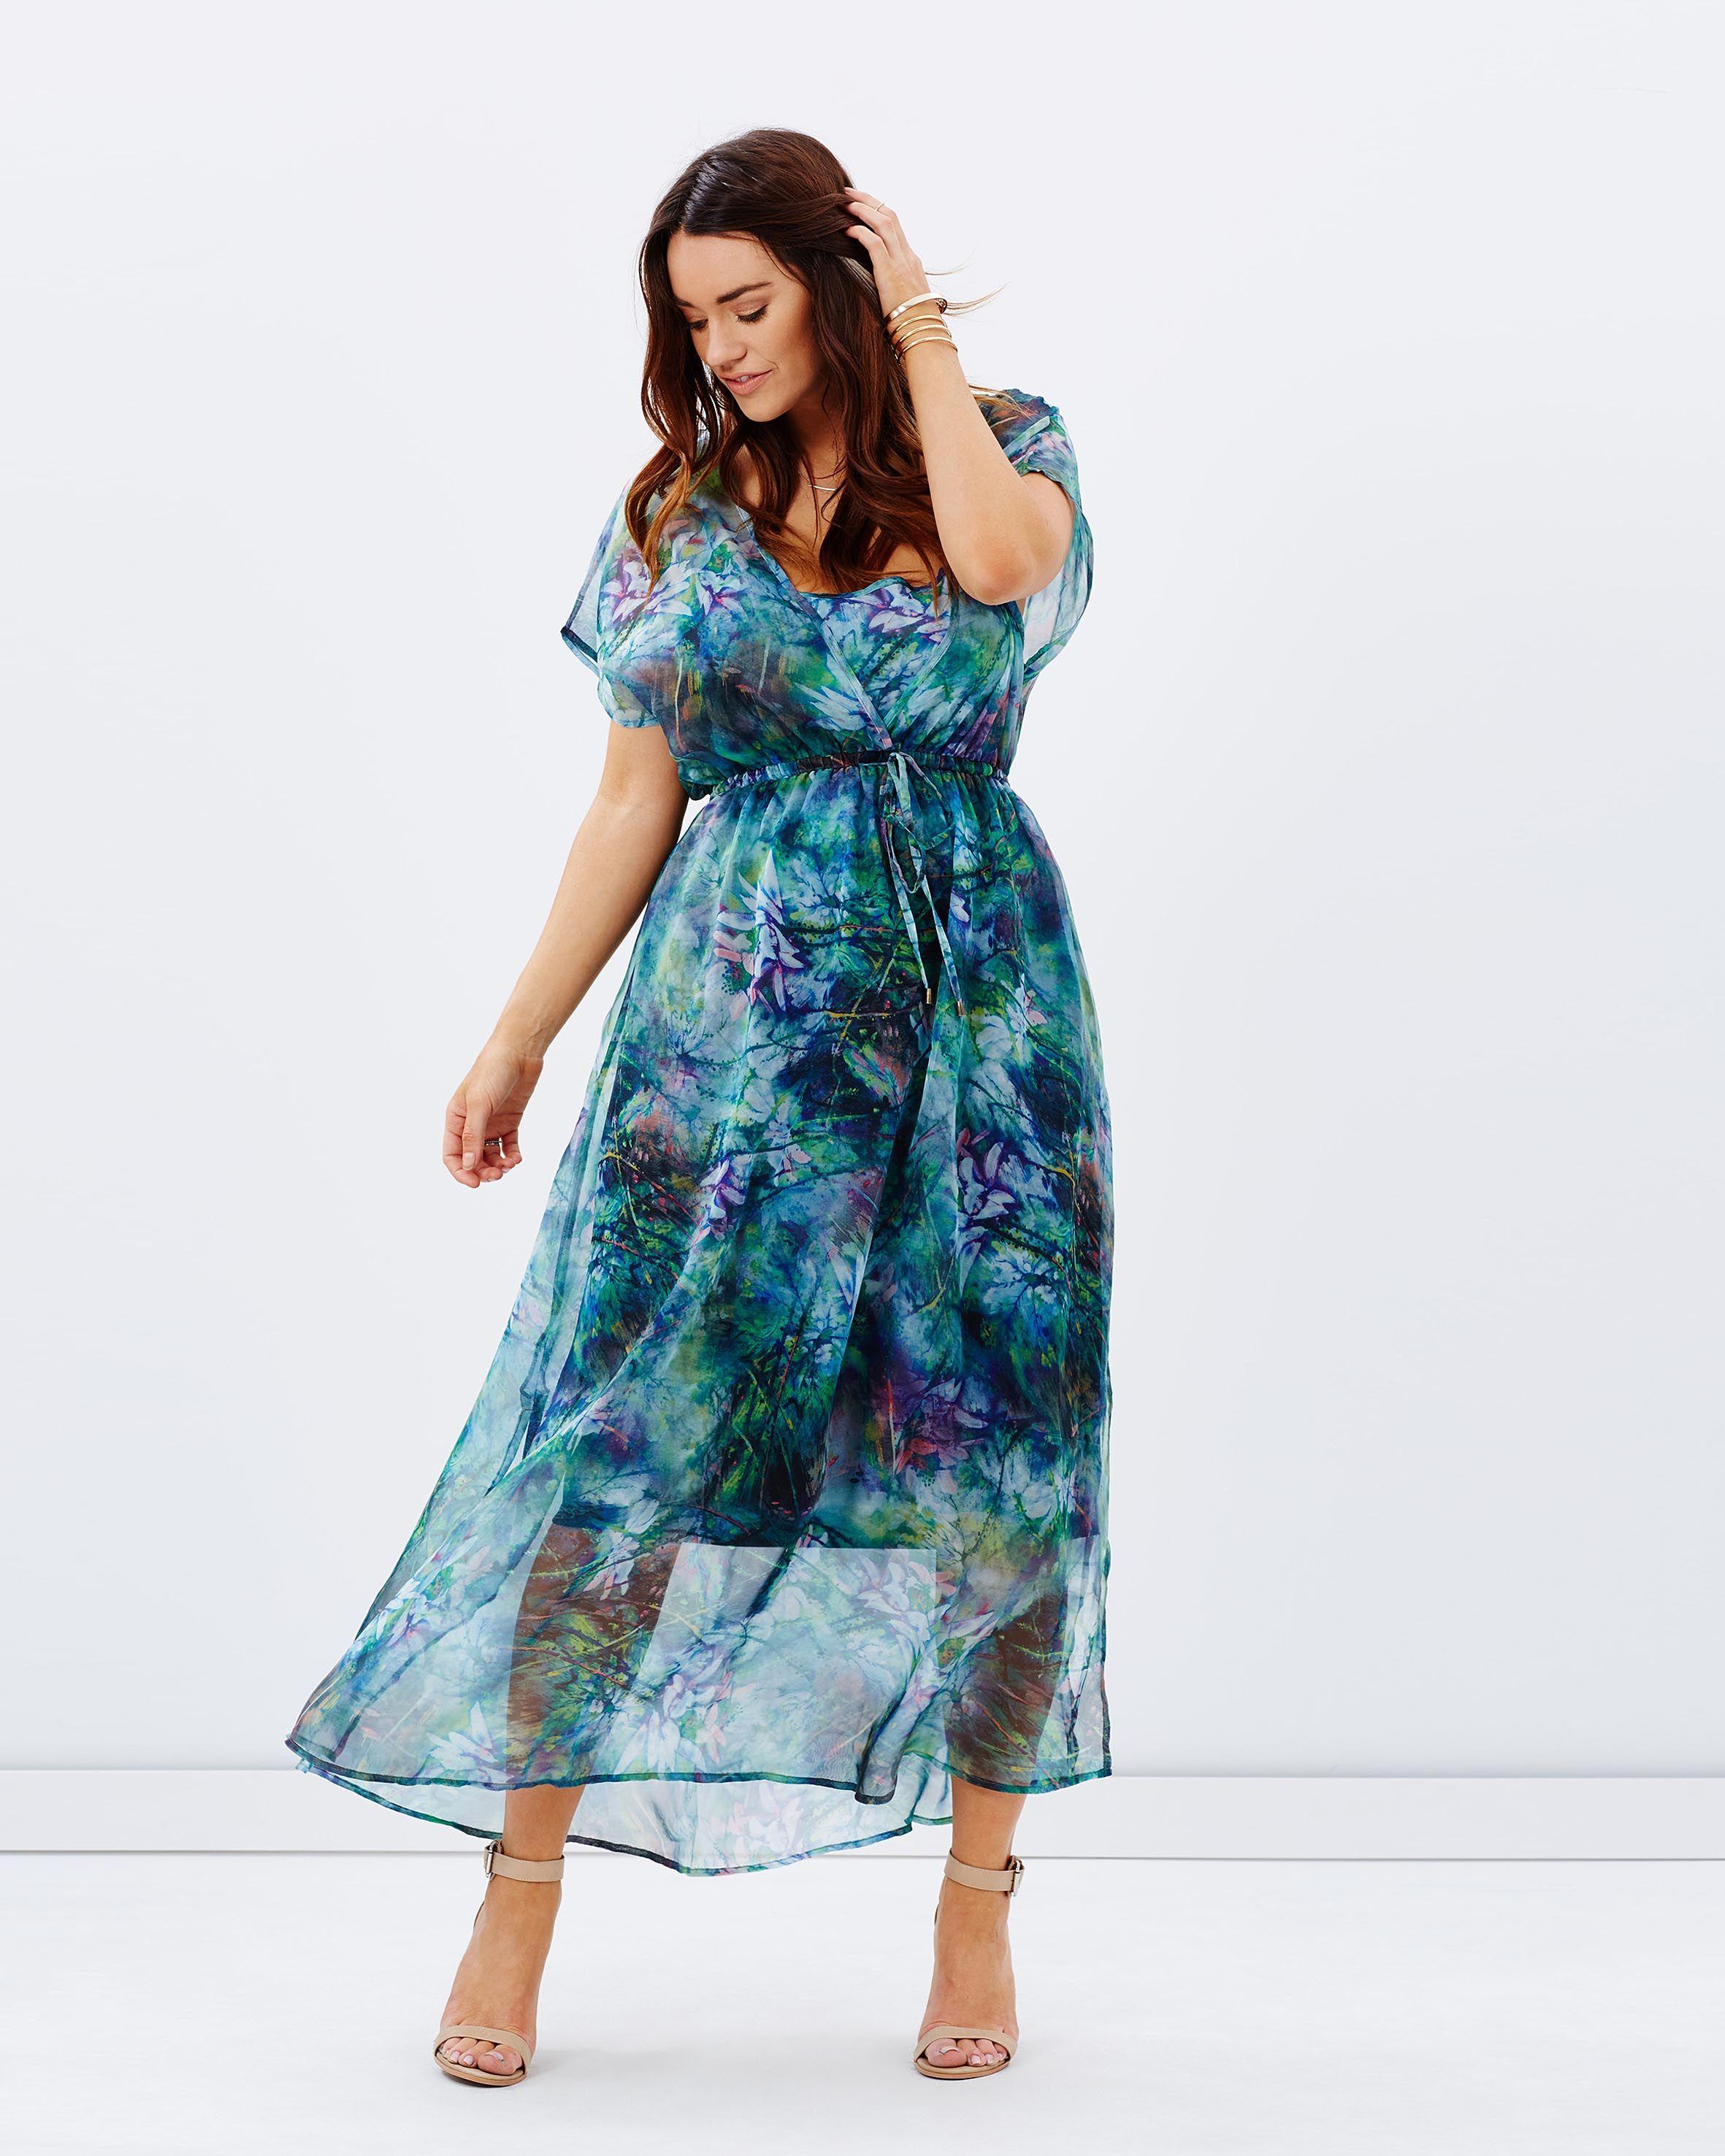 Evening maxi dress australia